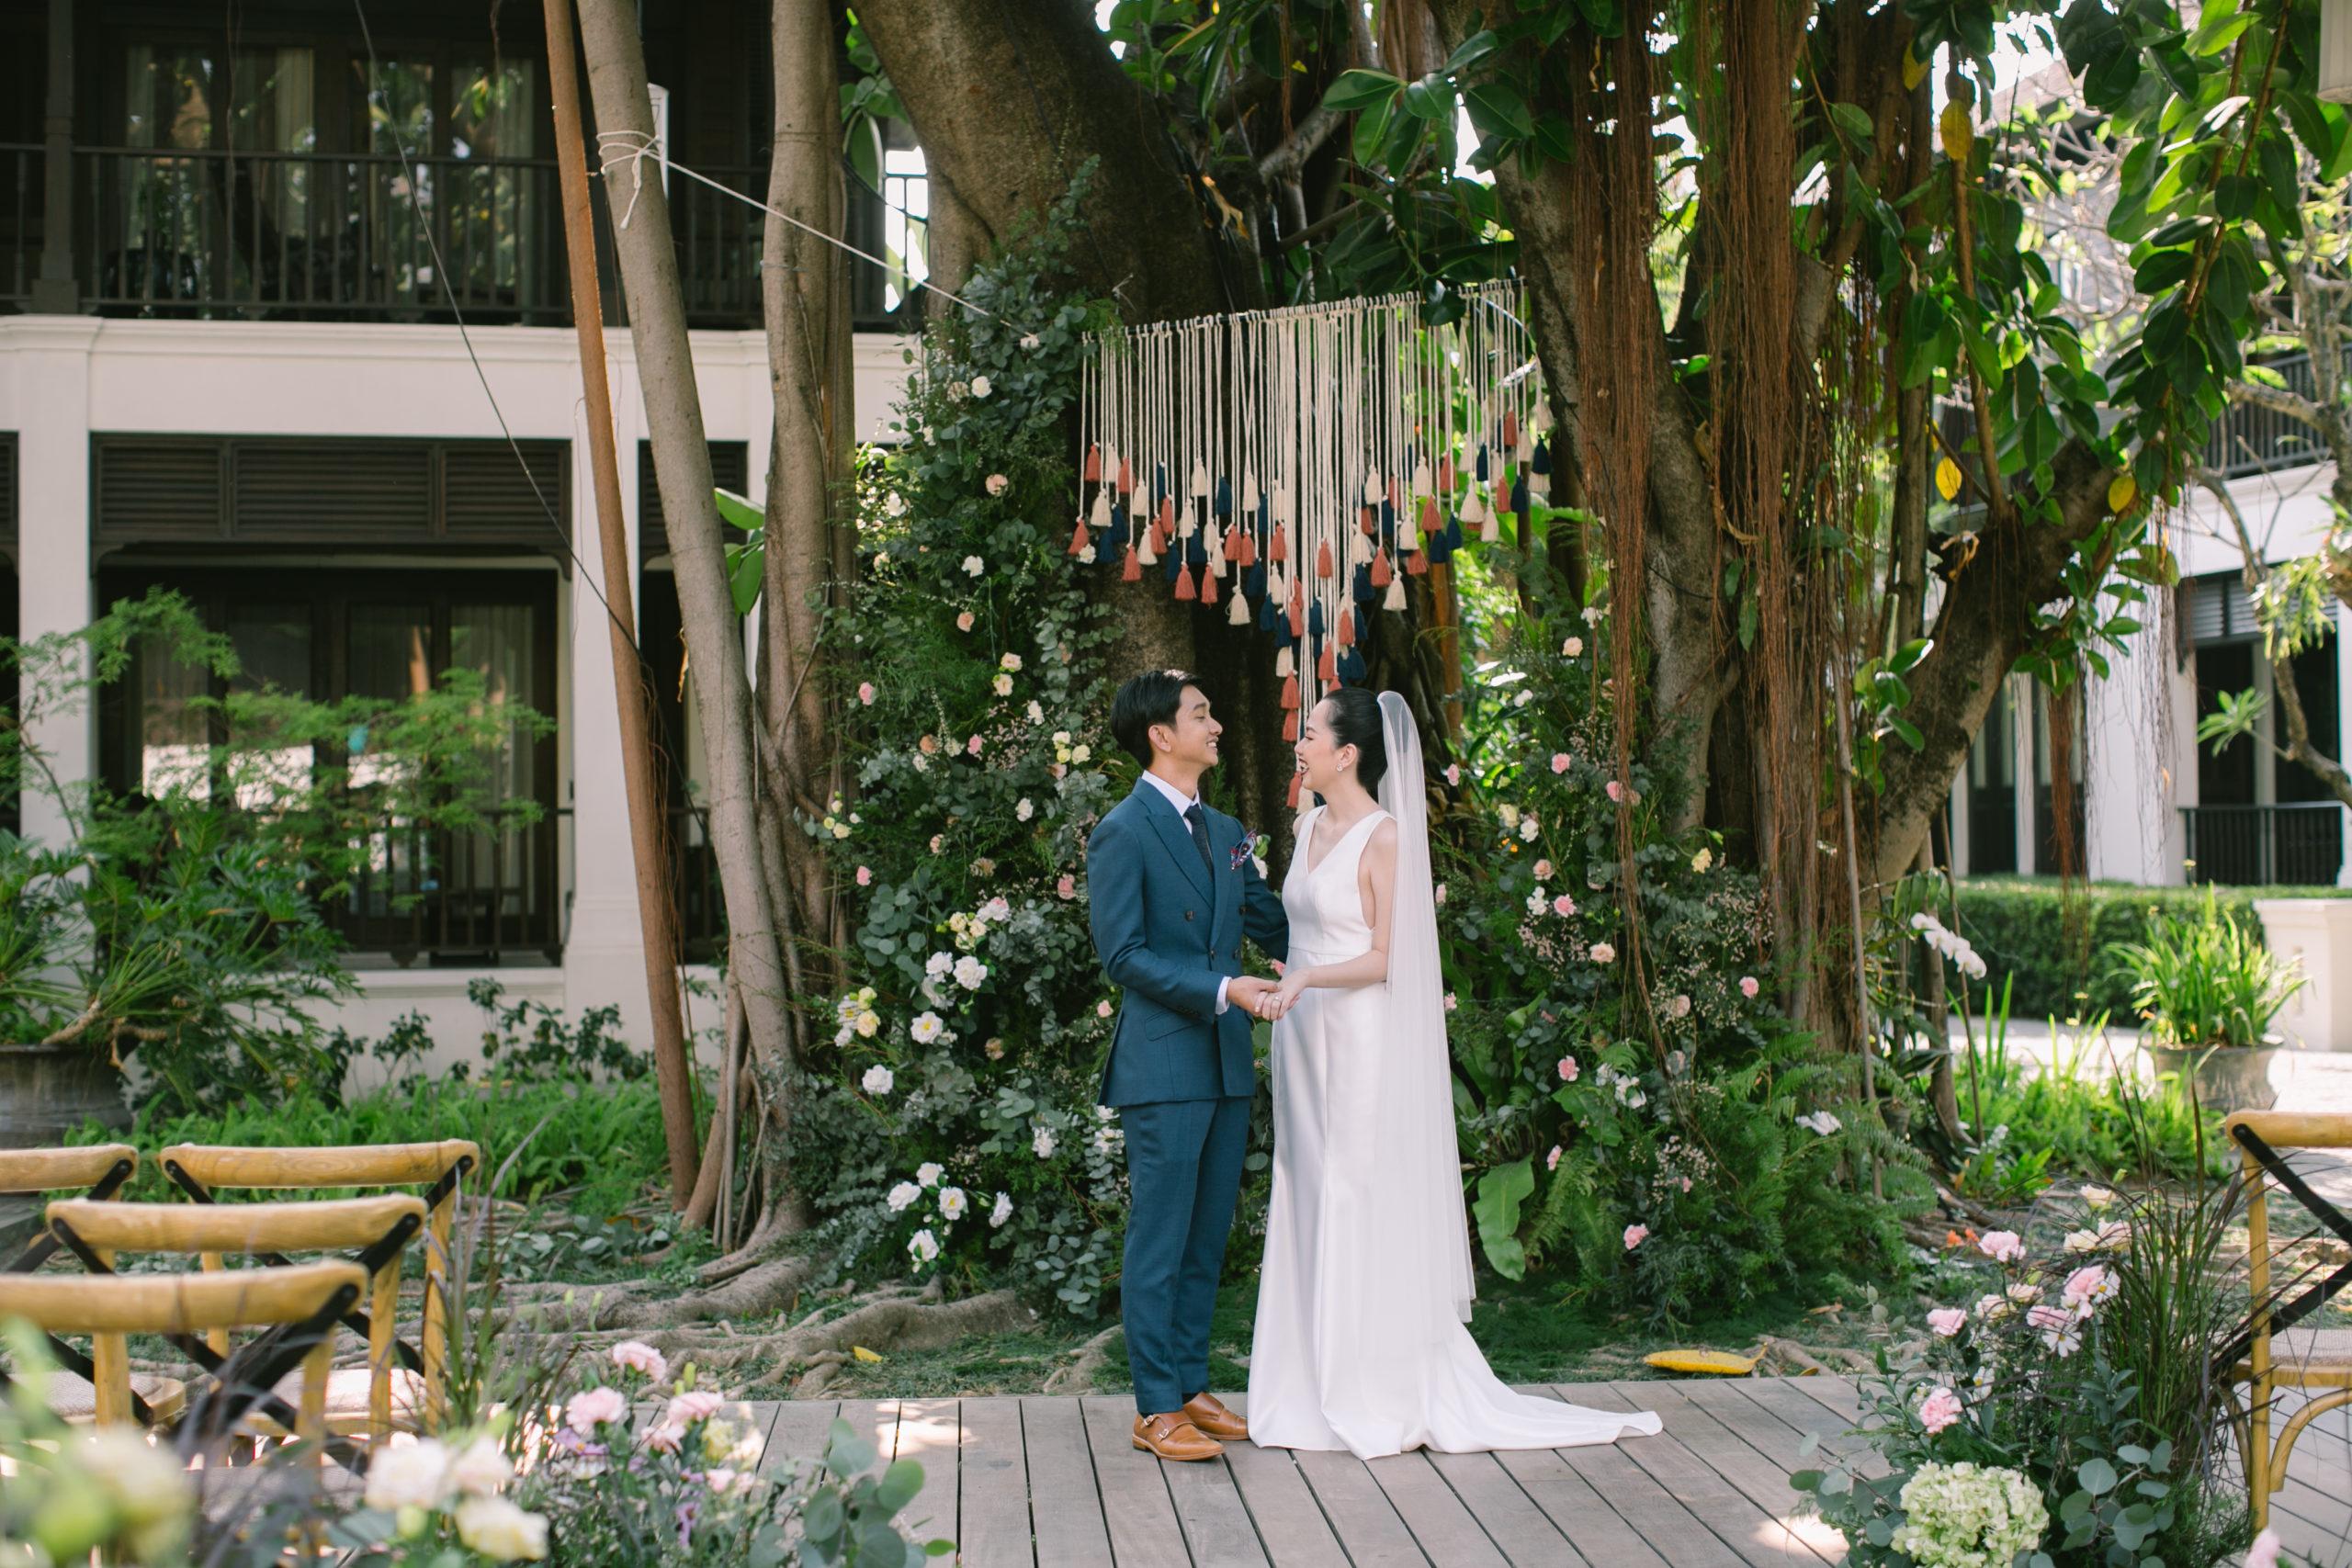 wonders-weddings-รีวิว-งานแต่งงาน-humanist